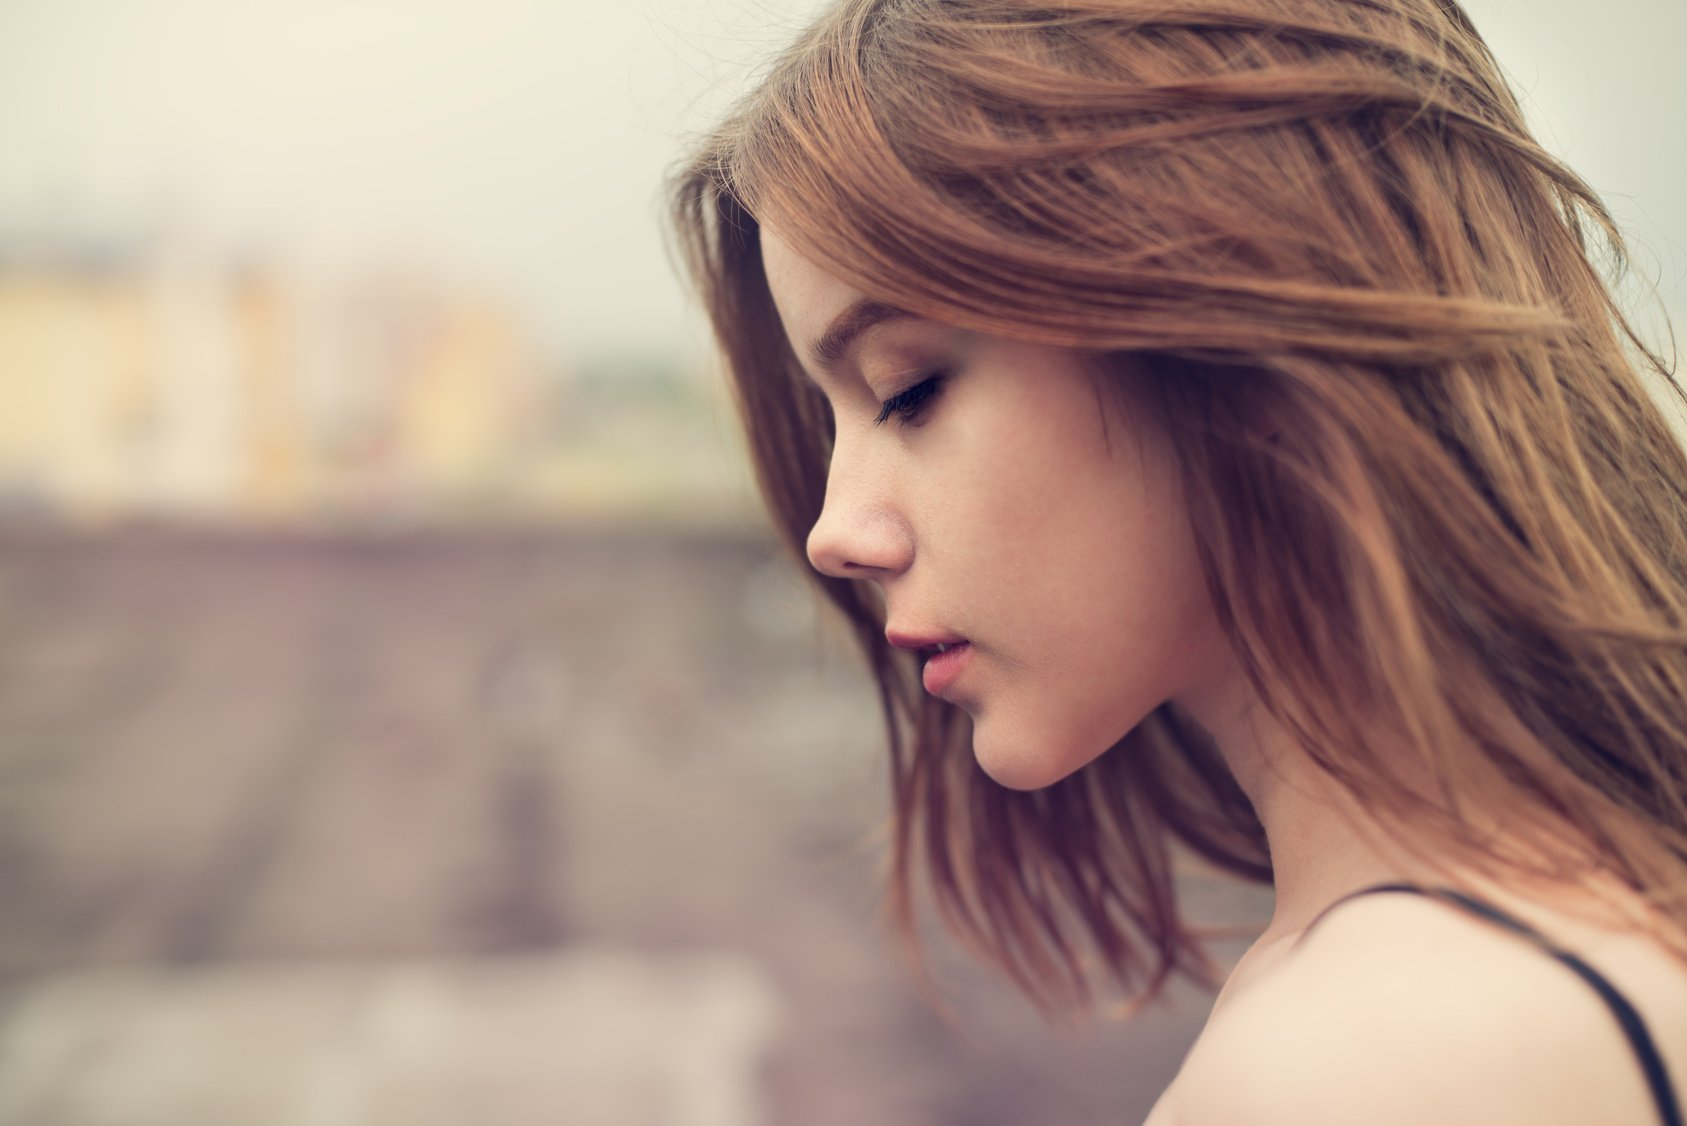 Profile of a beautiful girl closeup